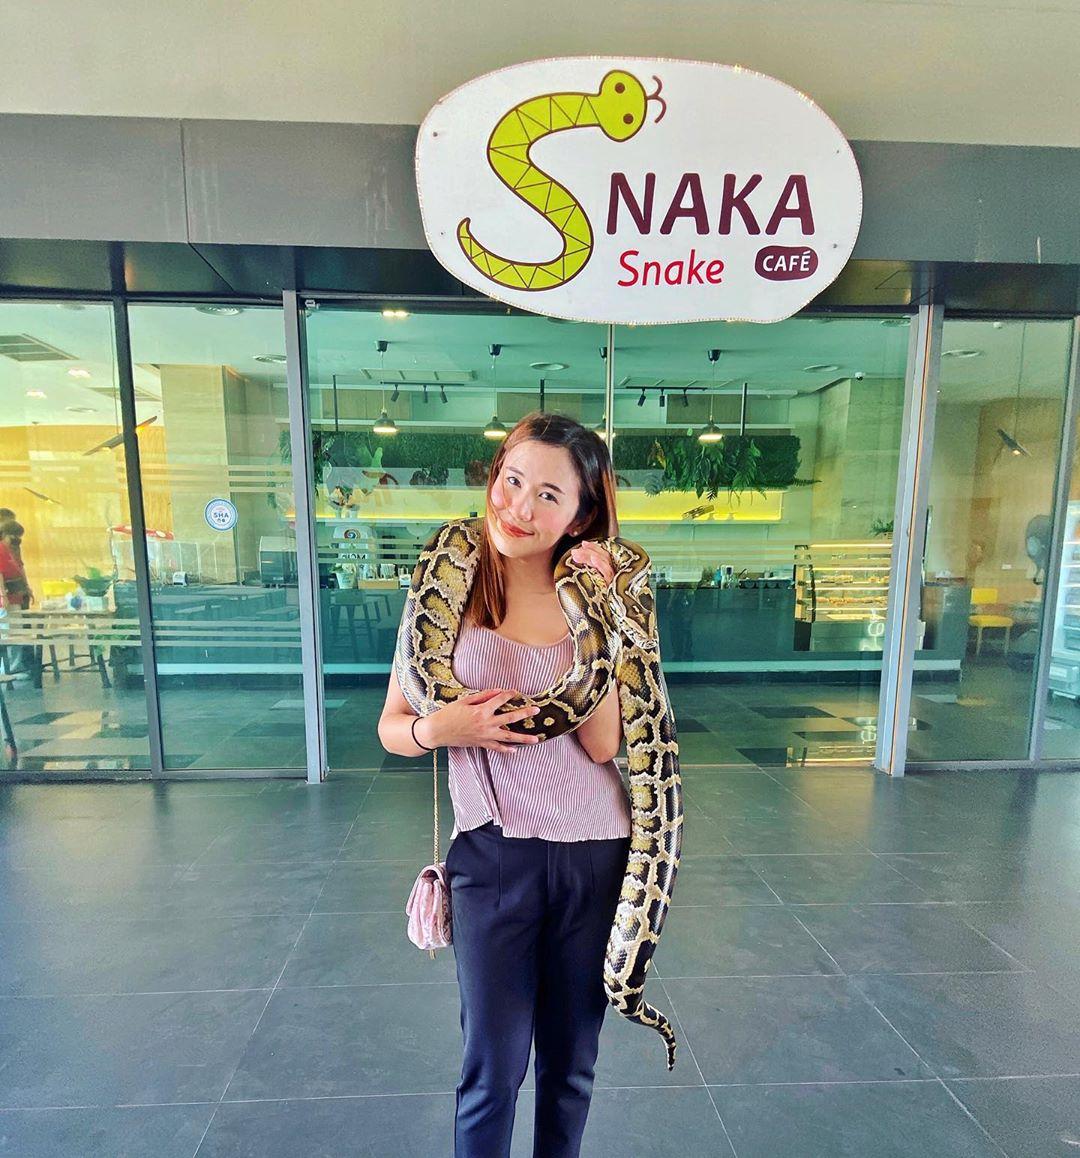 XplodeLIAO_泰国蛇cafe1